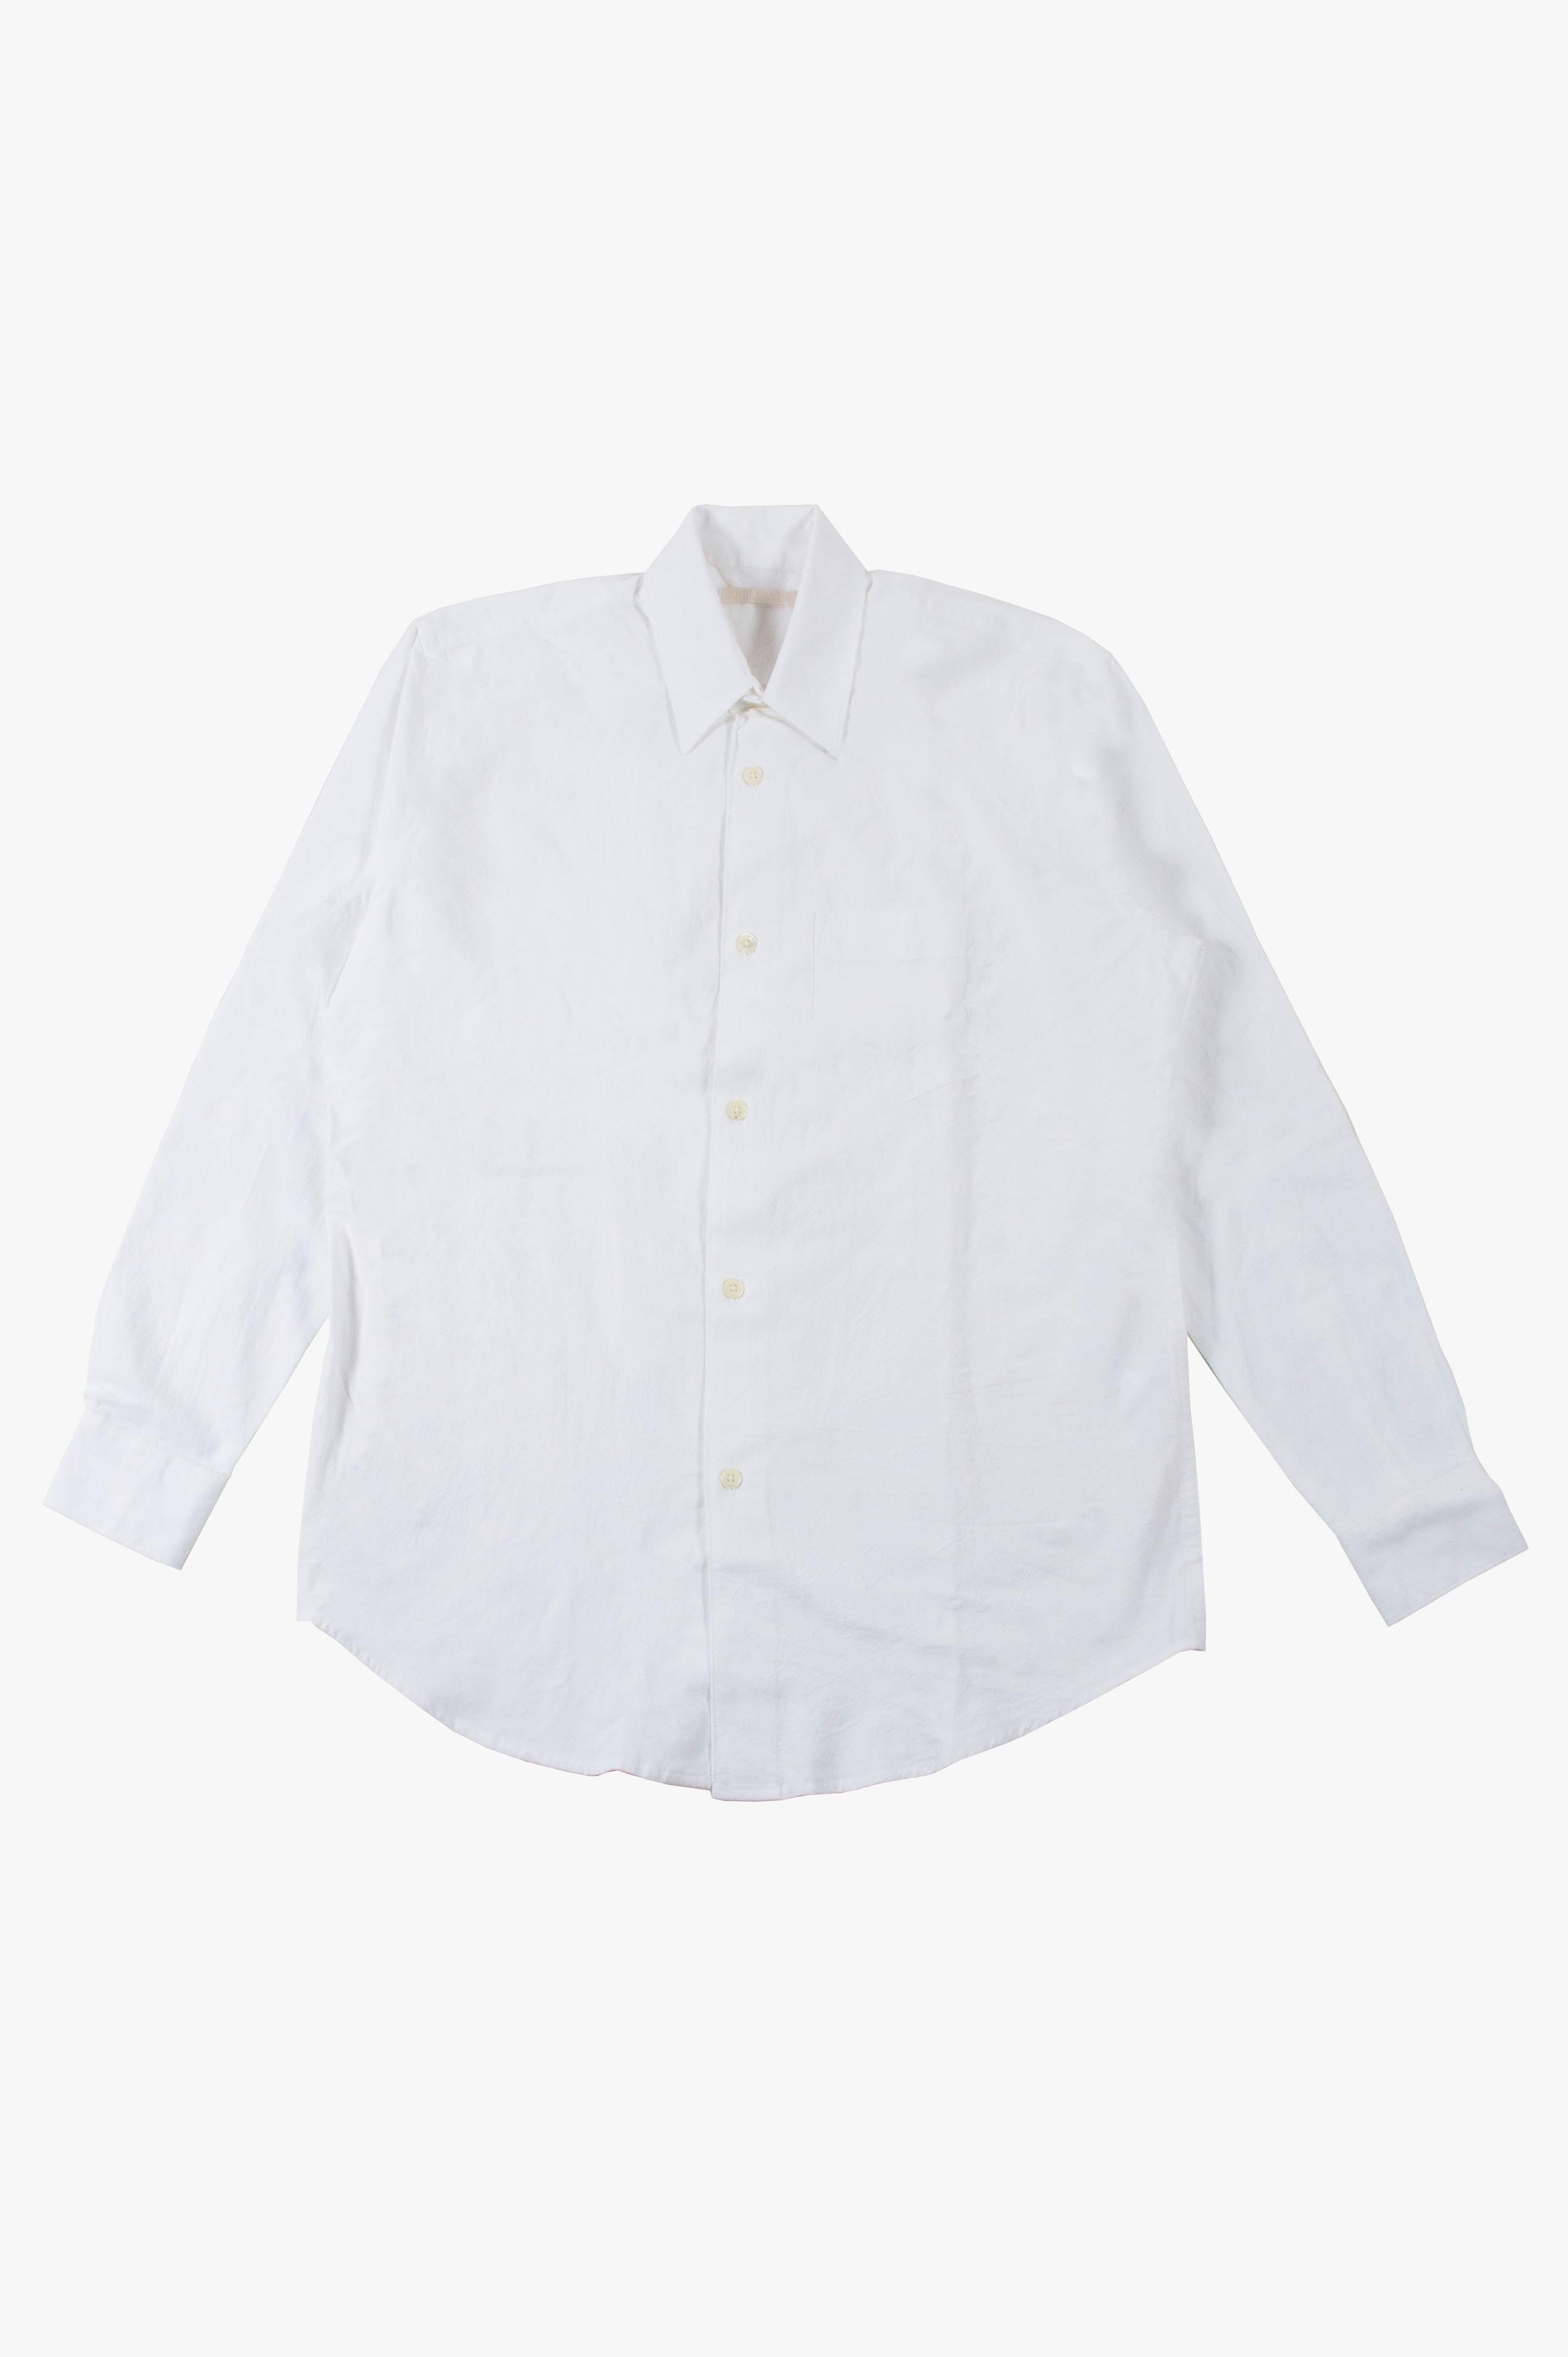 Initial Shirt White